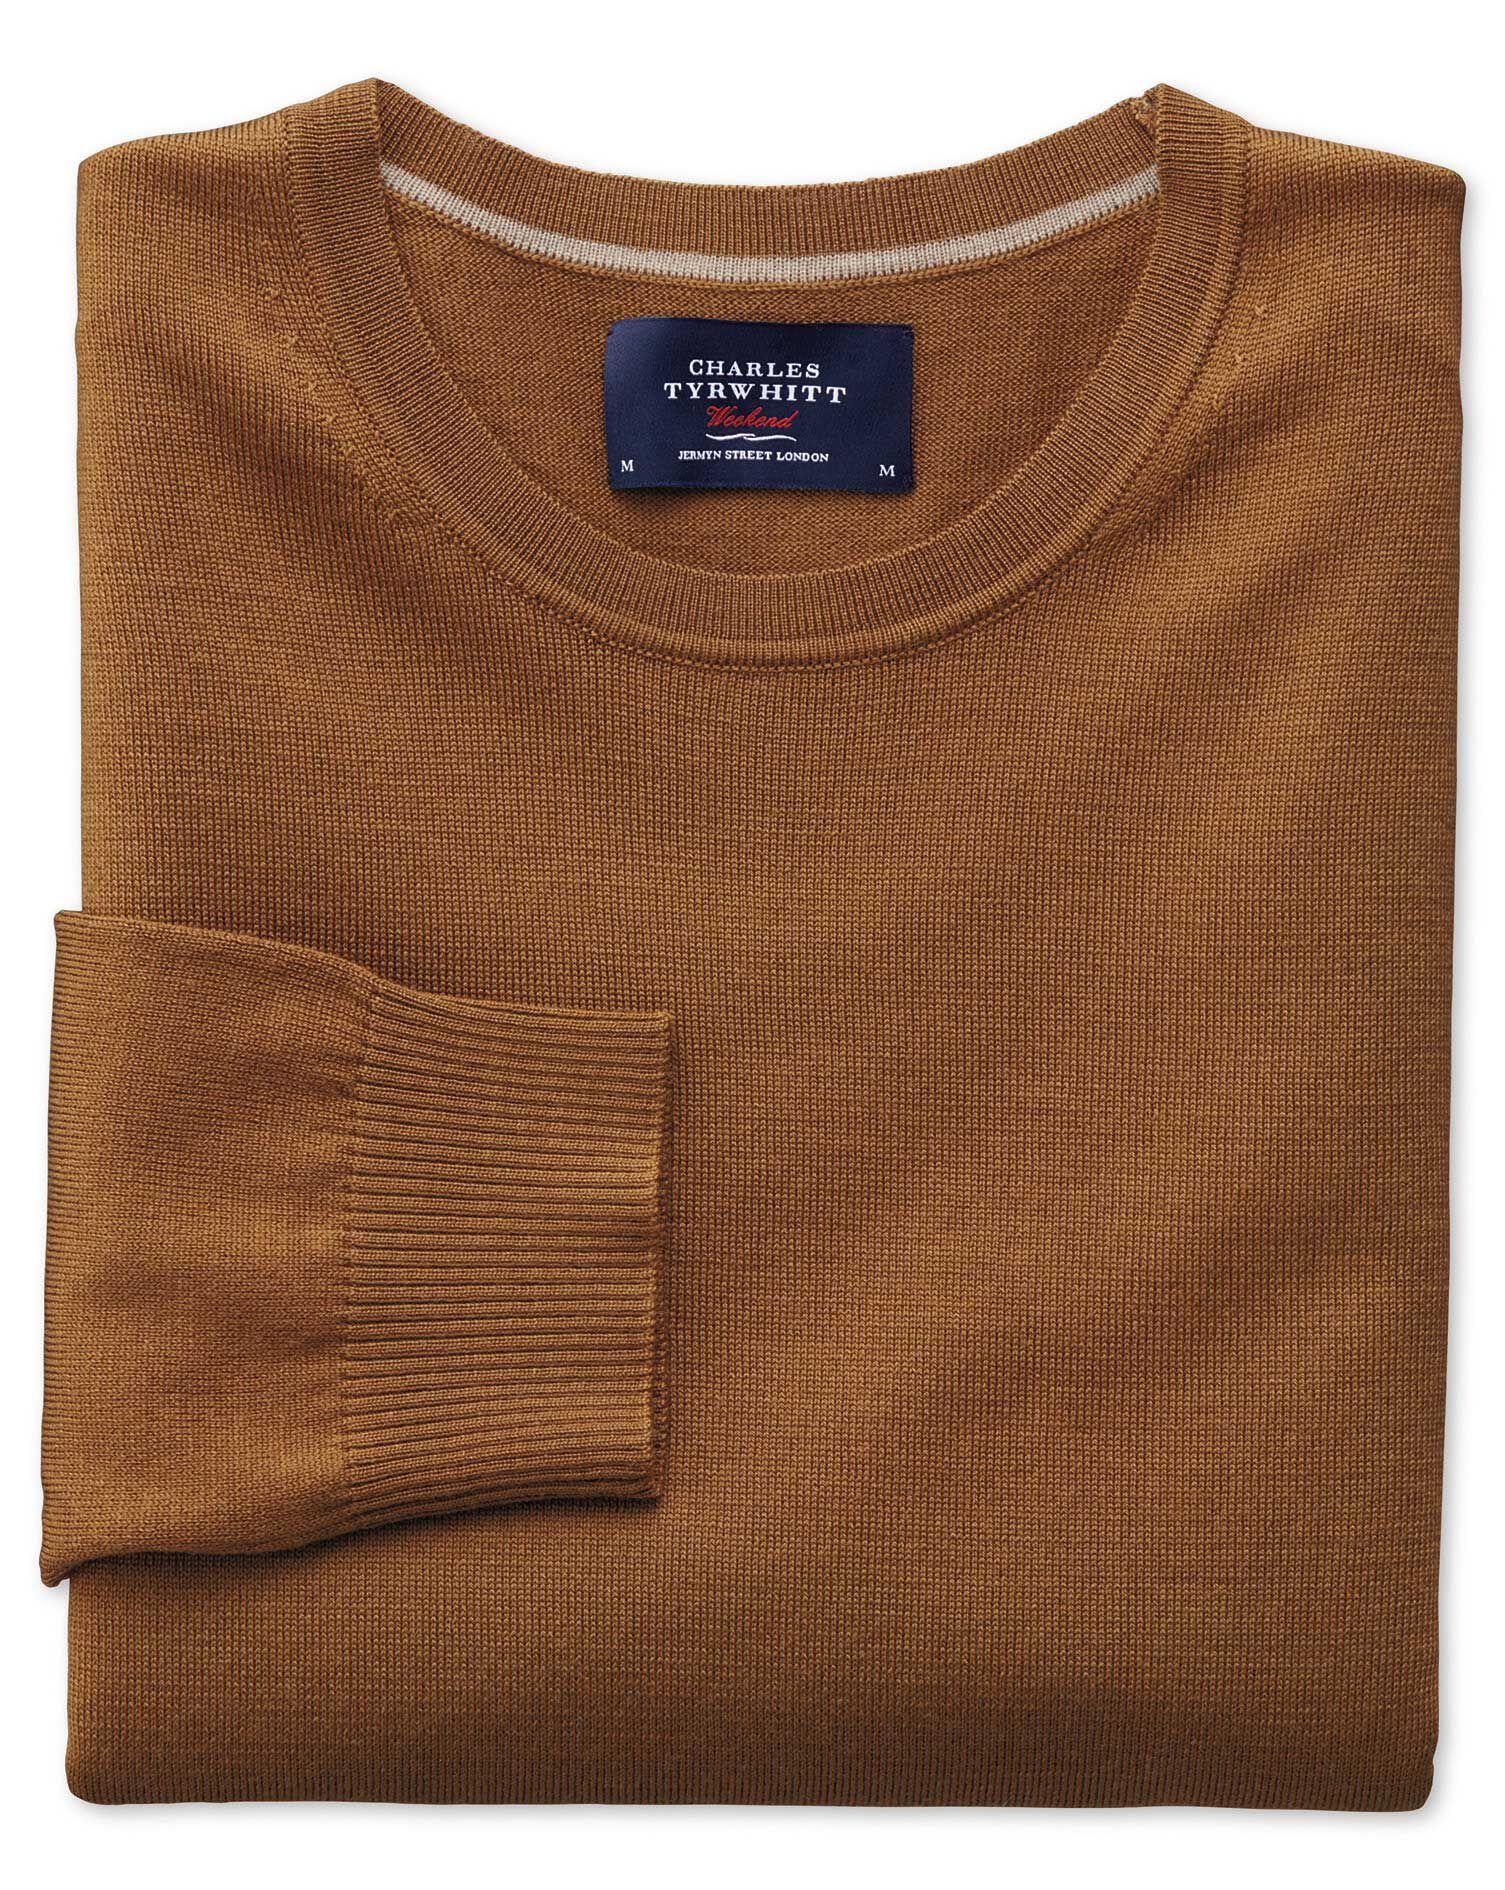 Tan Merino Wool Crew Neck Jumper Size XXXL by Charles Tyrwhitt